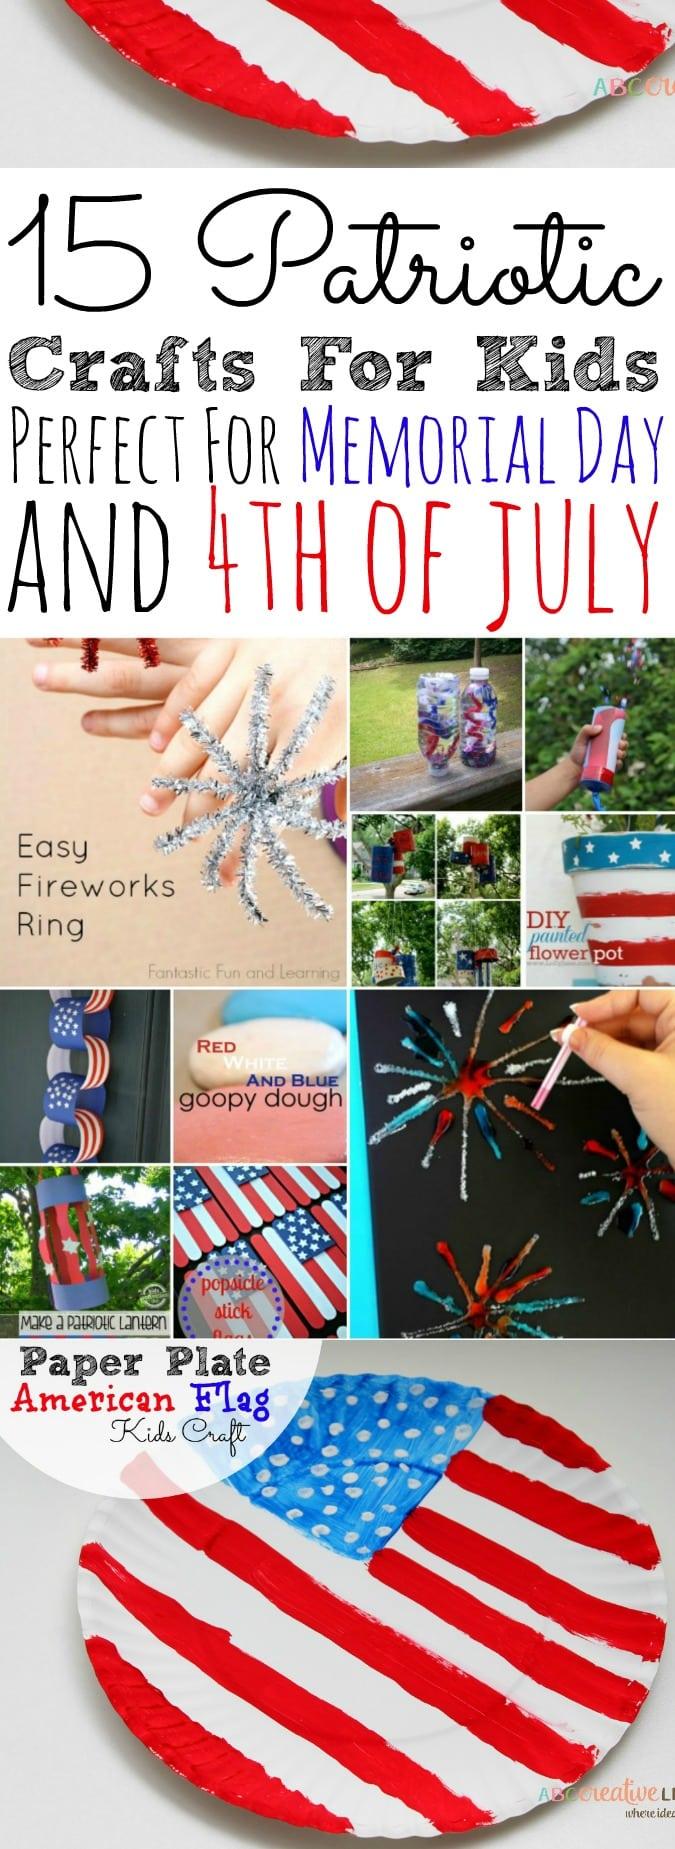 15 Patriotic Crafts For Kids - simplytodaylife.com